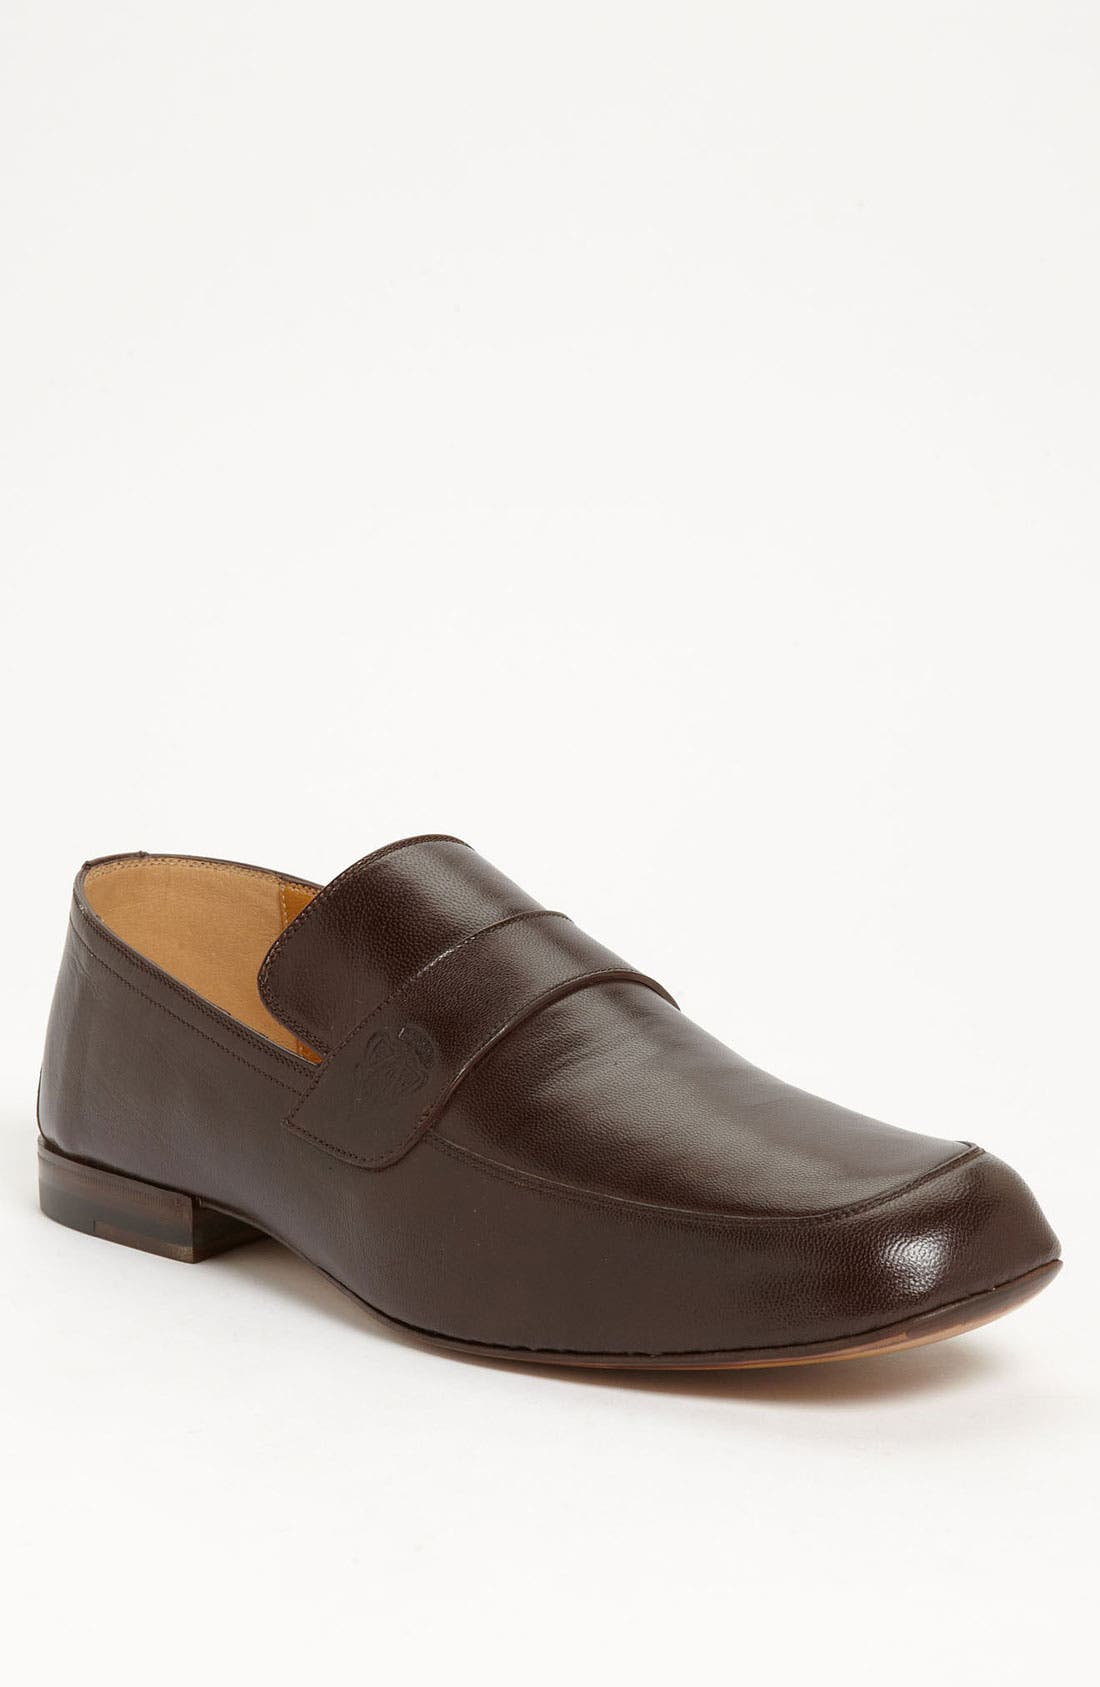 Alternate Image 1 Selected - Gucci 'Calvaert' Loafer